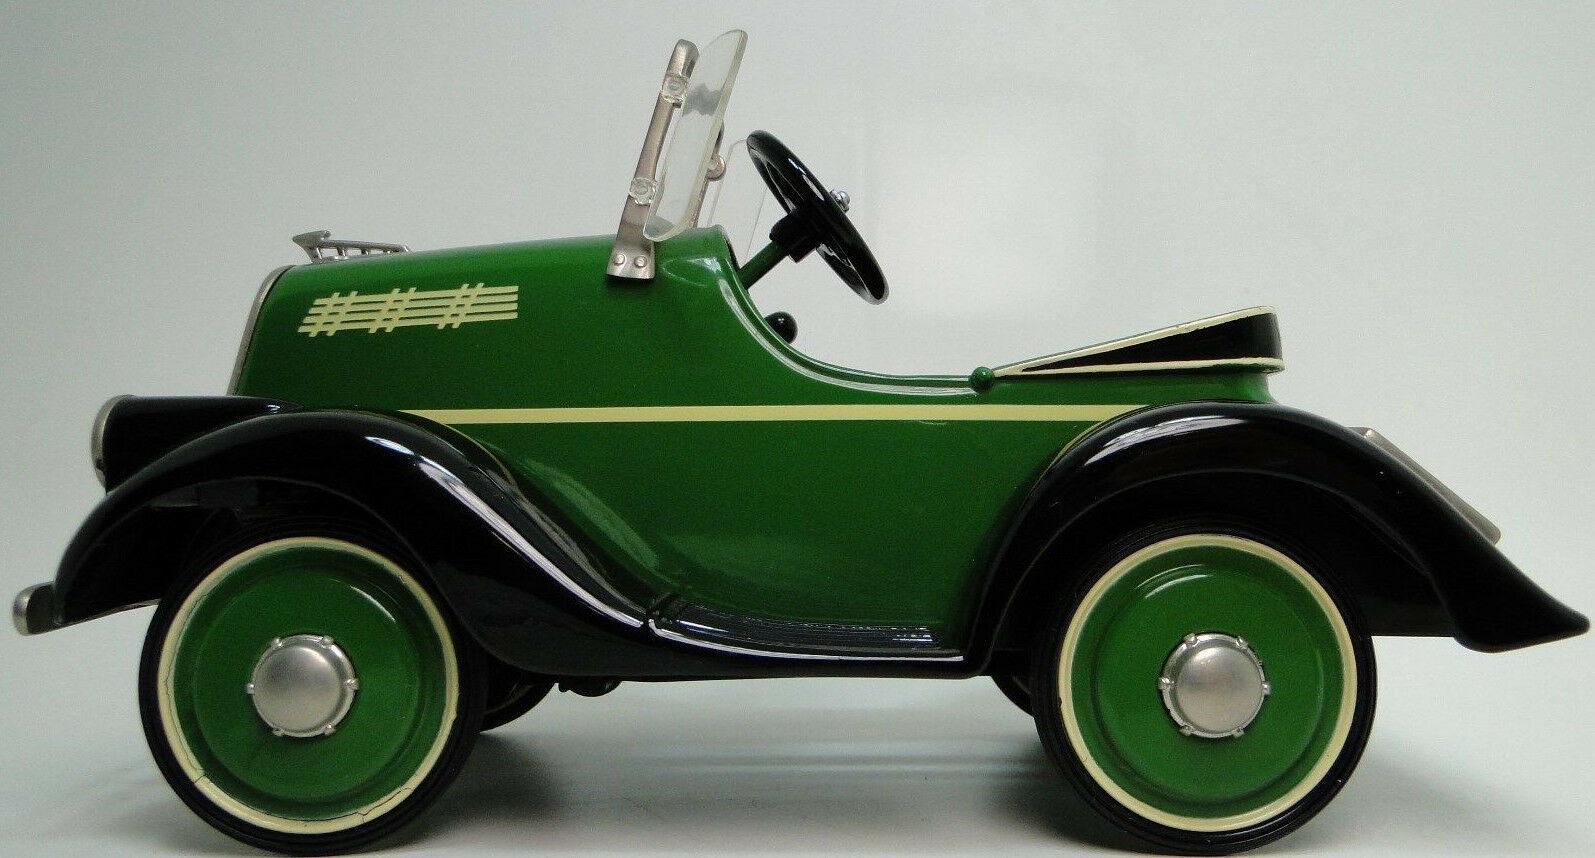 1930s Chevrolet Pedal Car Hot Rod Rare Vintage Classic